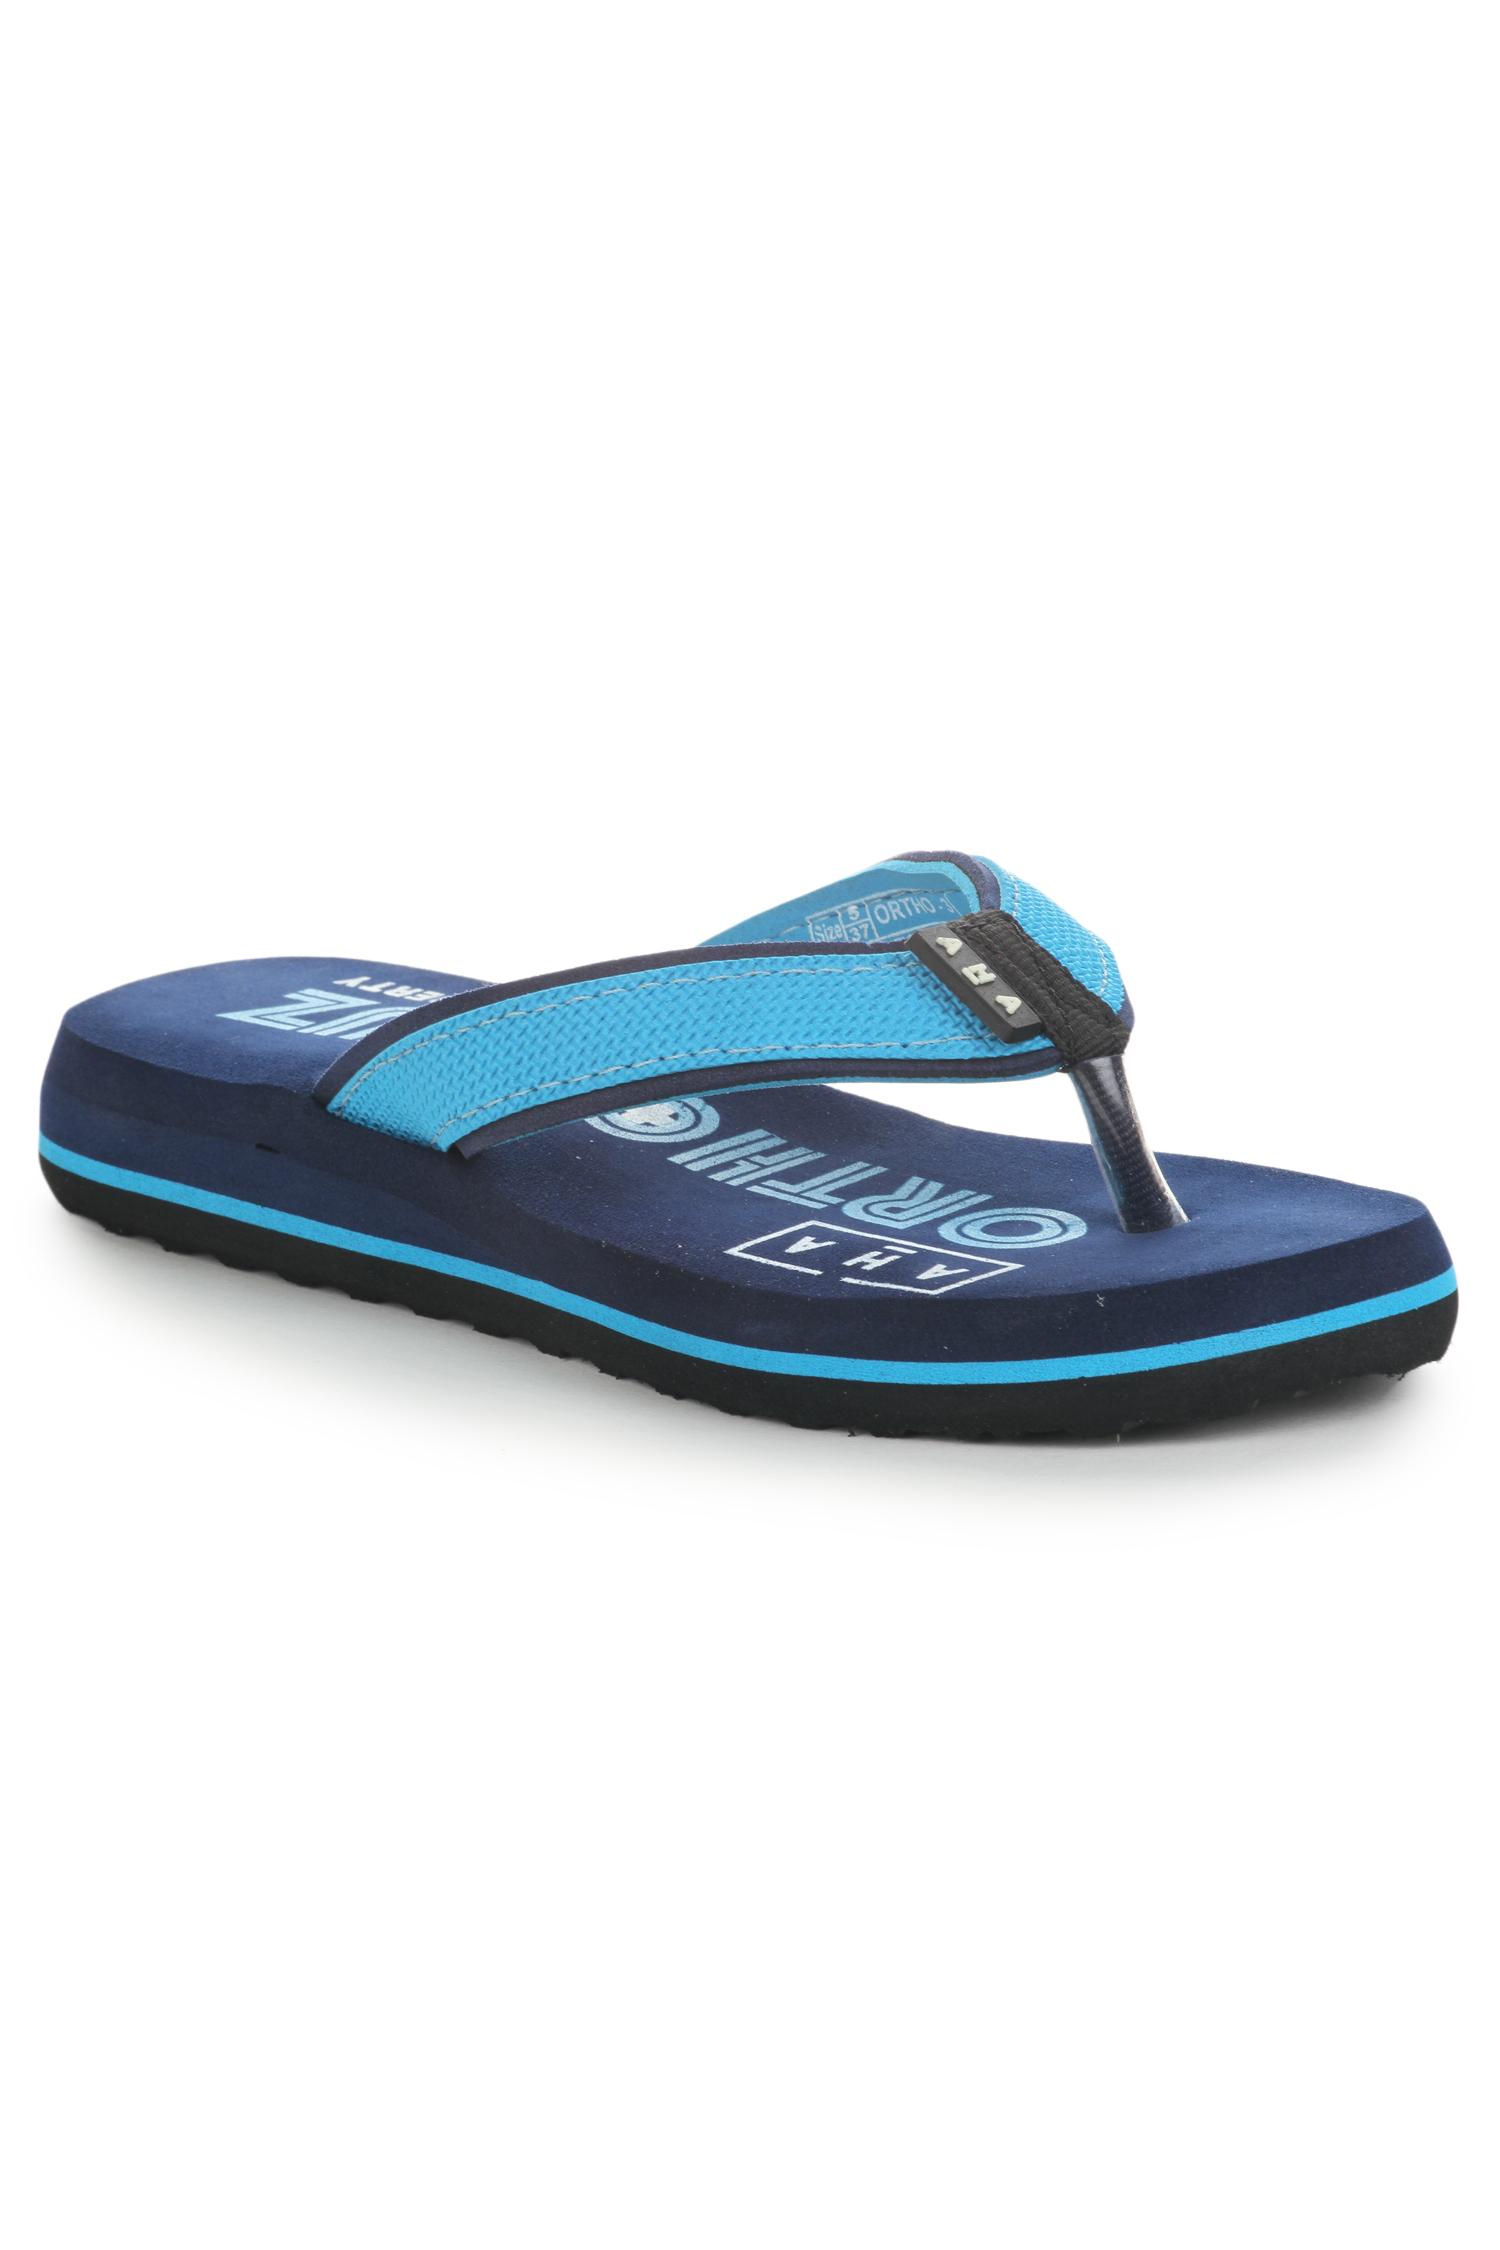 Liberty | Liberty A-HA Blue Flip Flops ORTHO-3_Blue For - Women